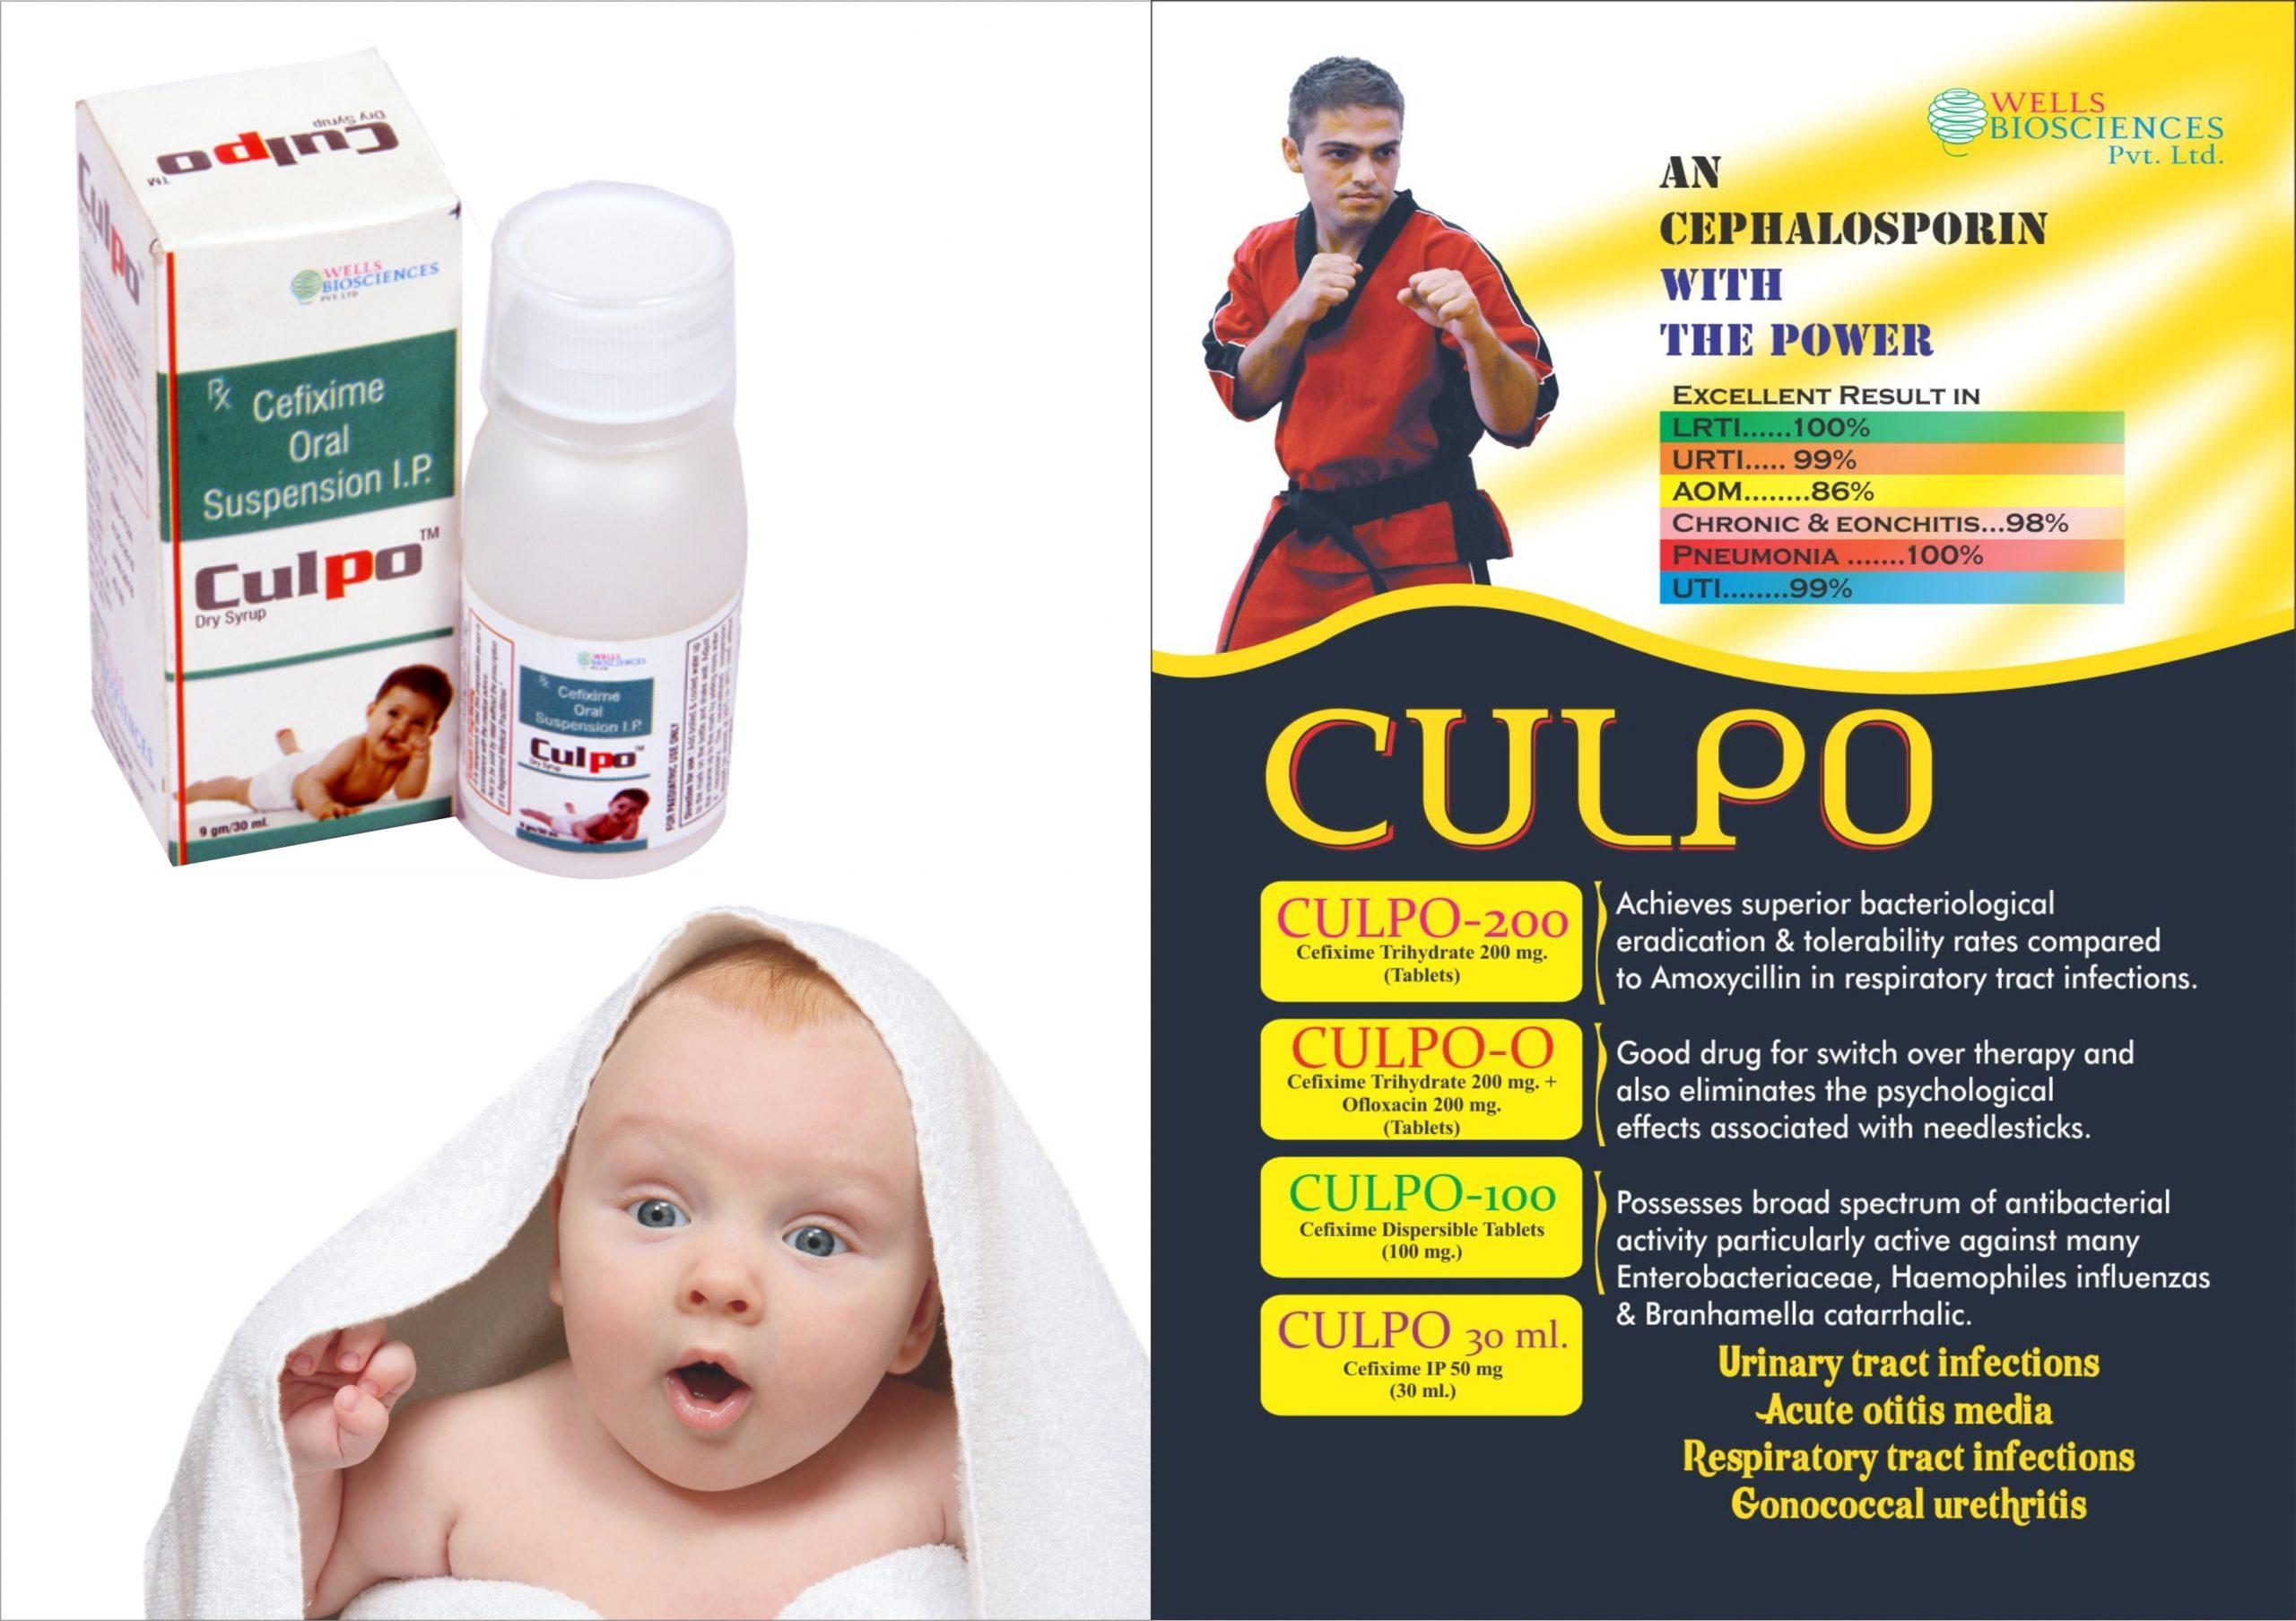 CULPO - Copy